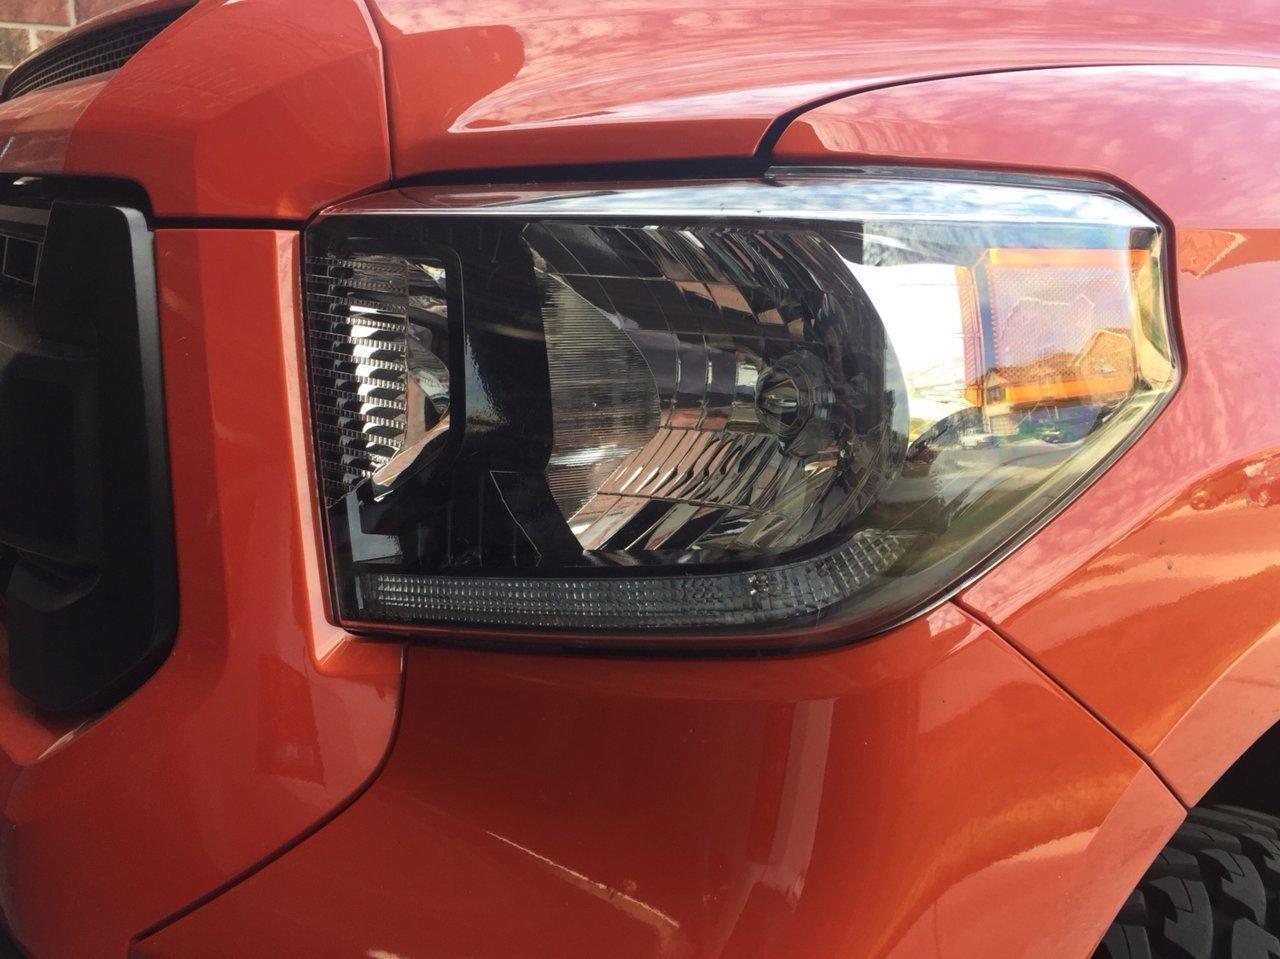 2018 Led Headlight Pnp Wire Harness Sales Thread Eledobleu Page Automotive Wiring 86870f2d51f278b02ffaefcfa7d7b0f1 628a79b04ff1bae46738b9ca0ca2653a86a82e26